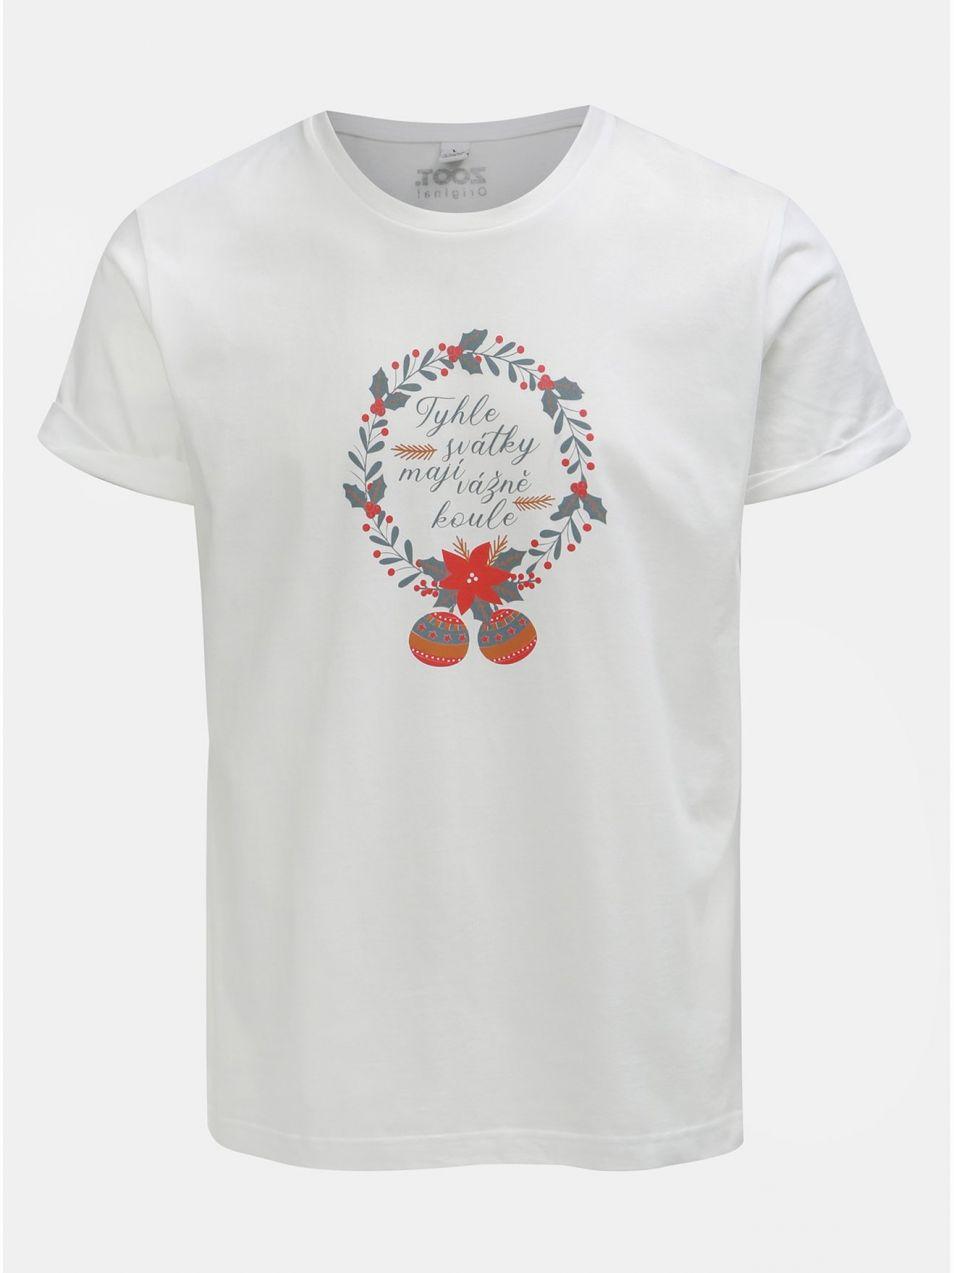 86f11a11b7de3 Biele pánske tričko s potlačou ZOOT Original Svátky mají koule ...